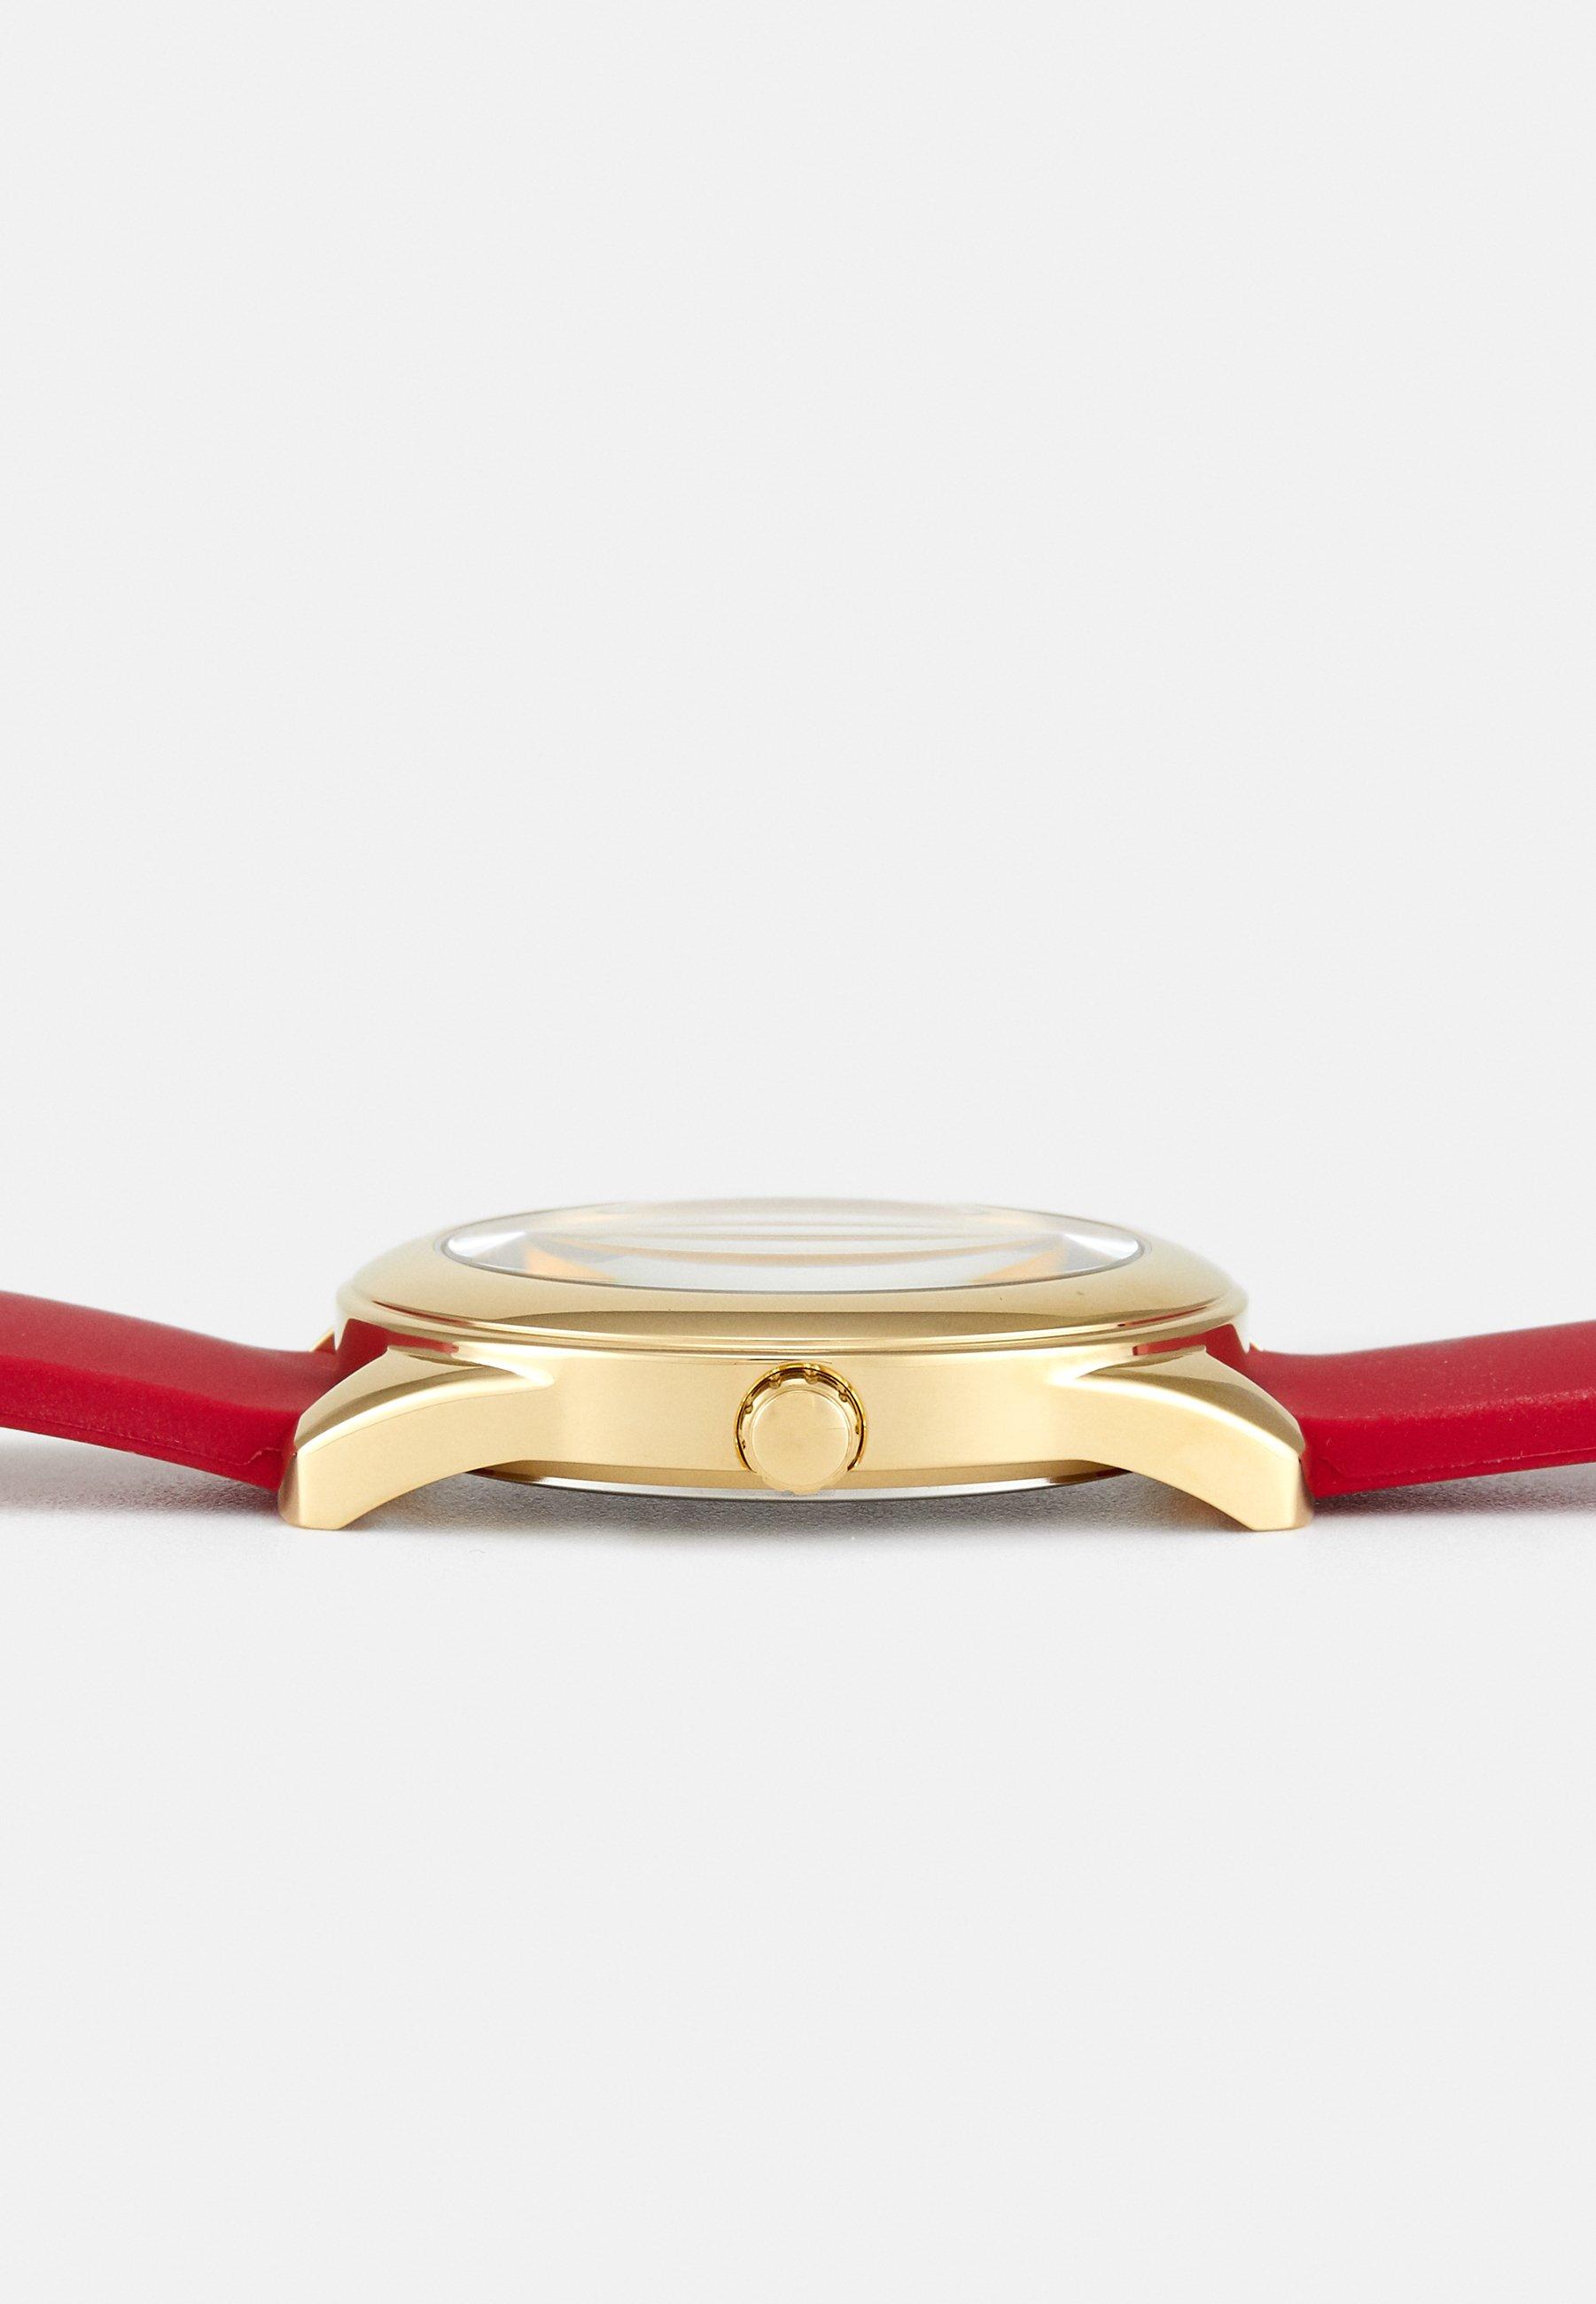 Guess Klokke - gold-coloured/red/gull zimHZ7touimPhJb